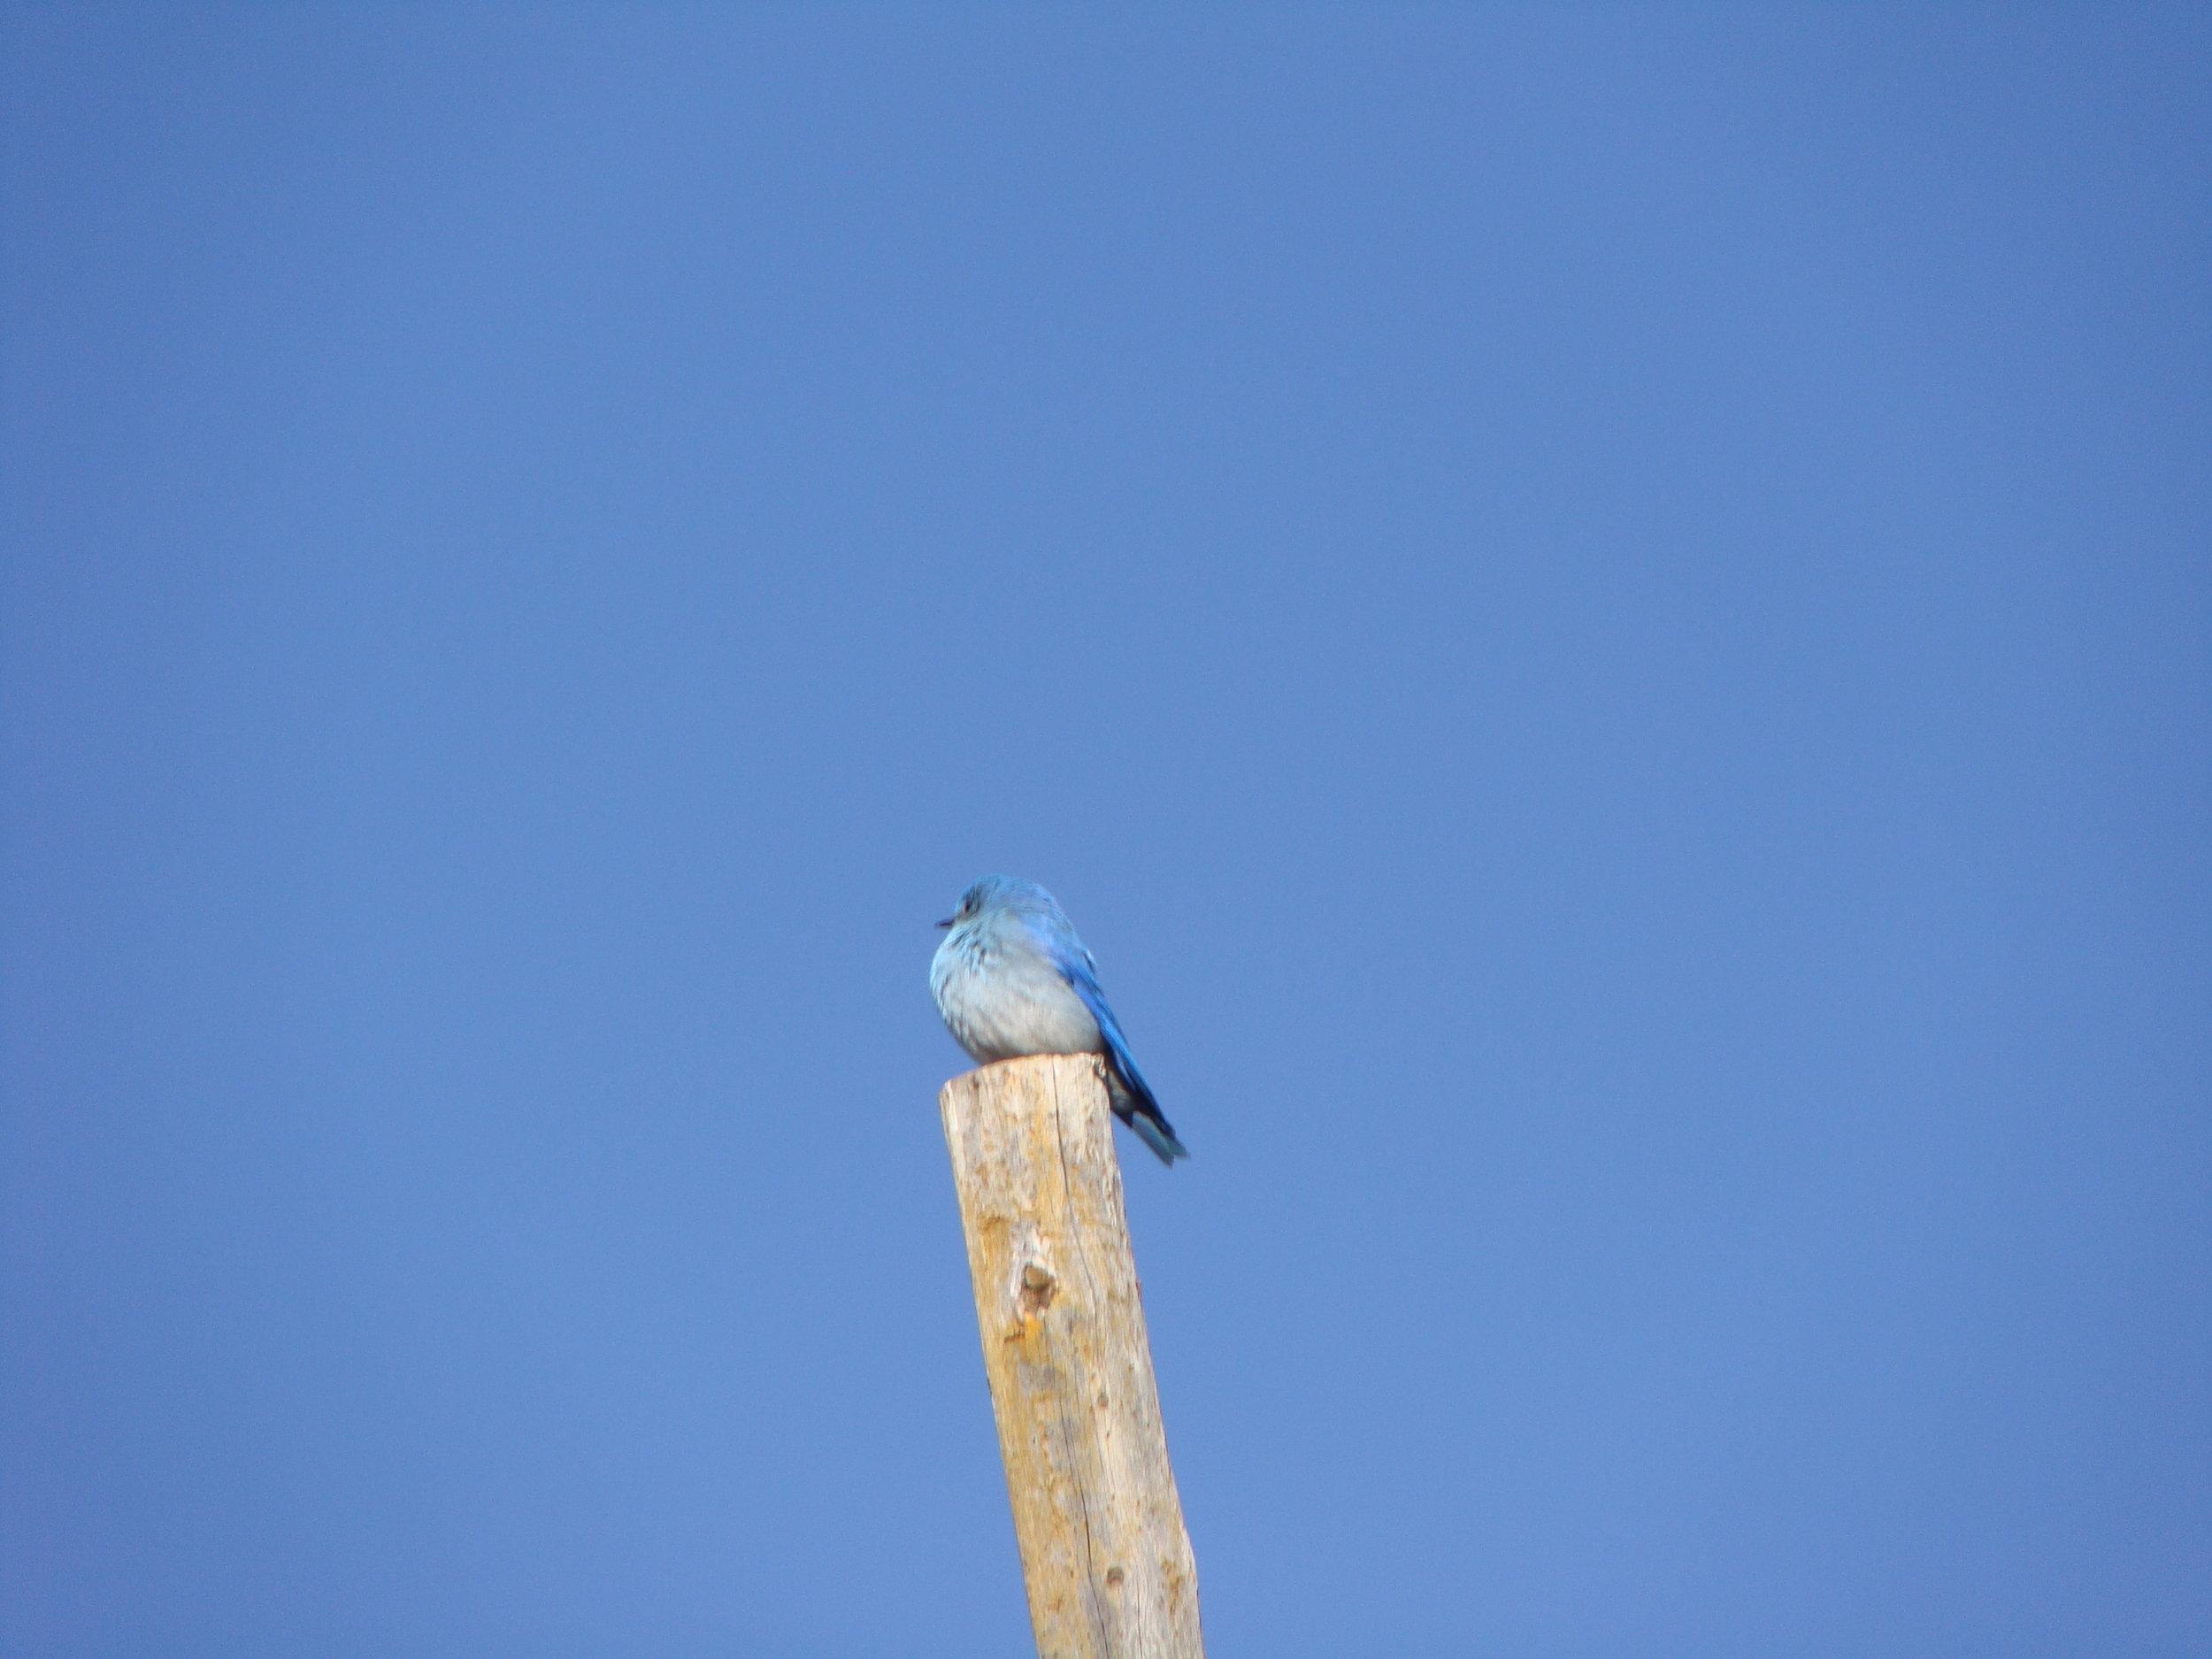 Bluebird, blue sky. Beautiful Day!